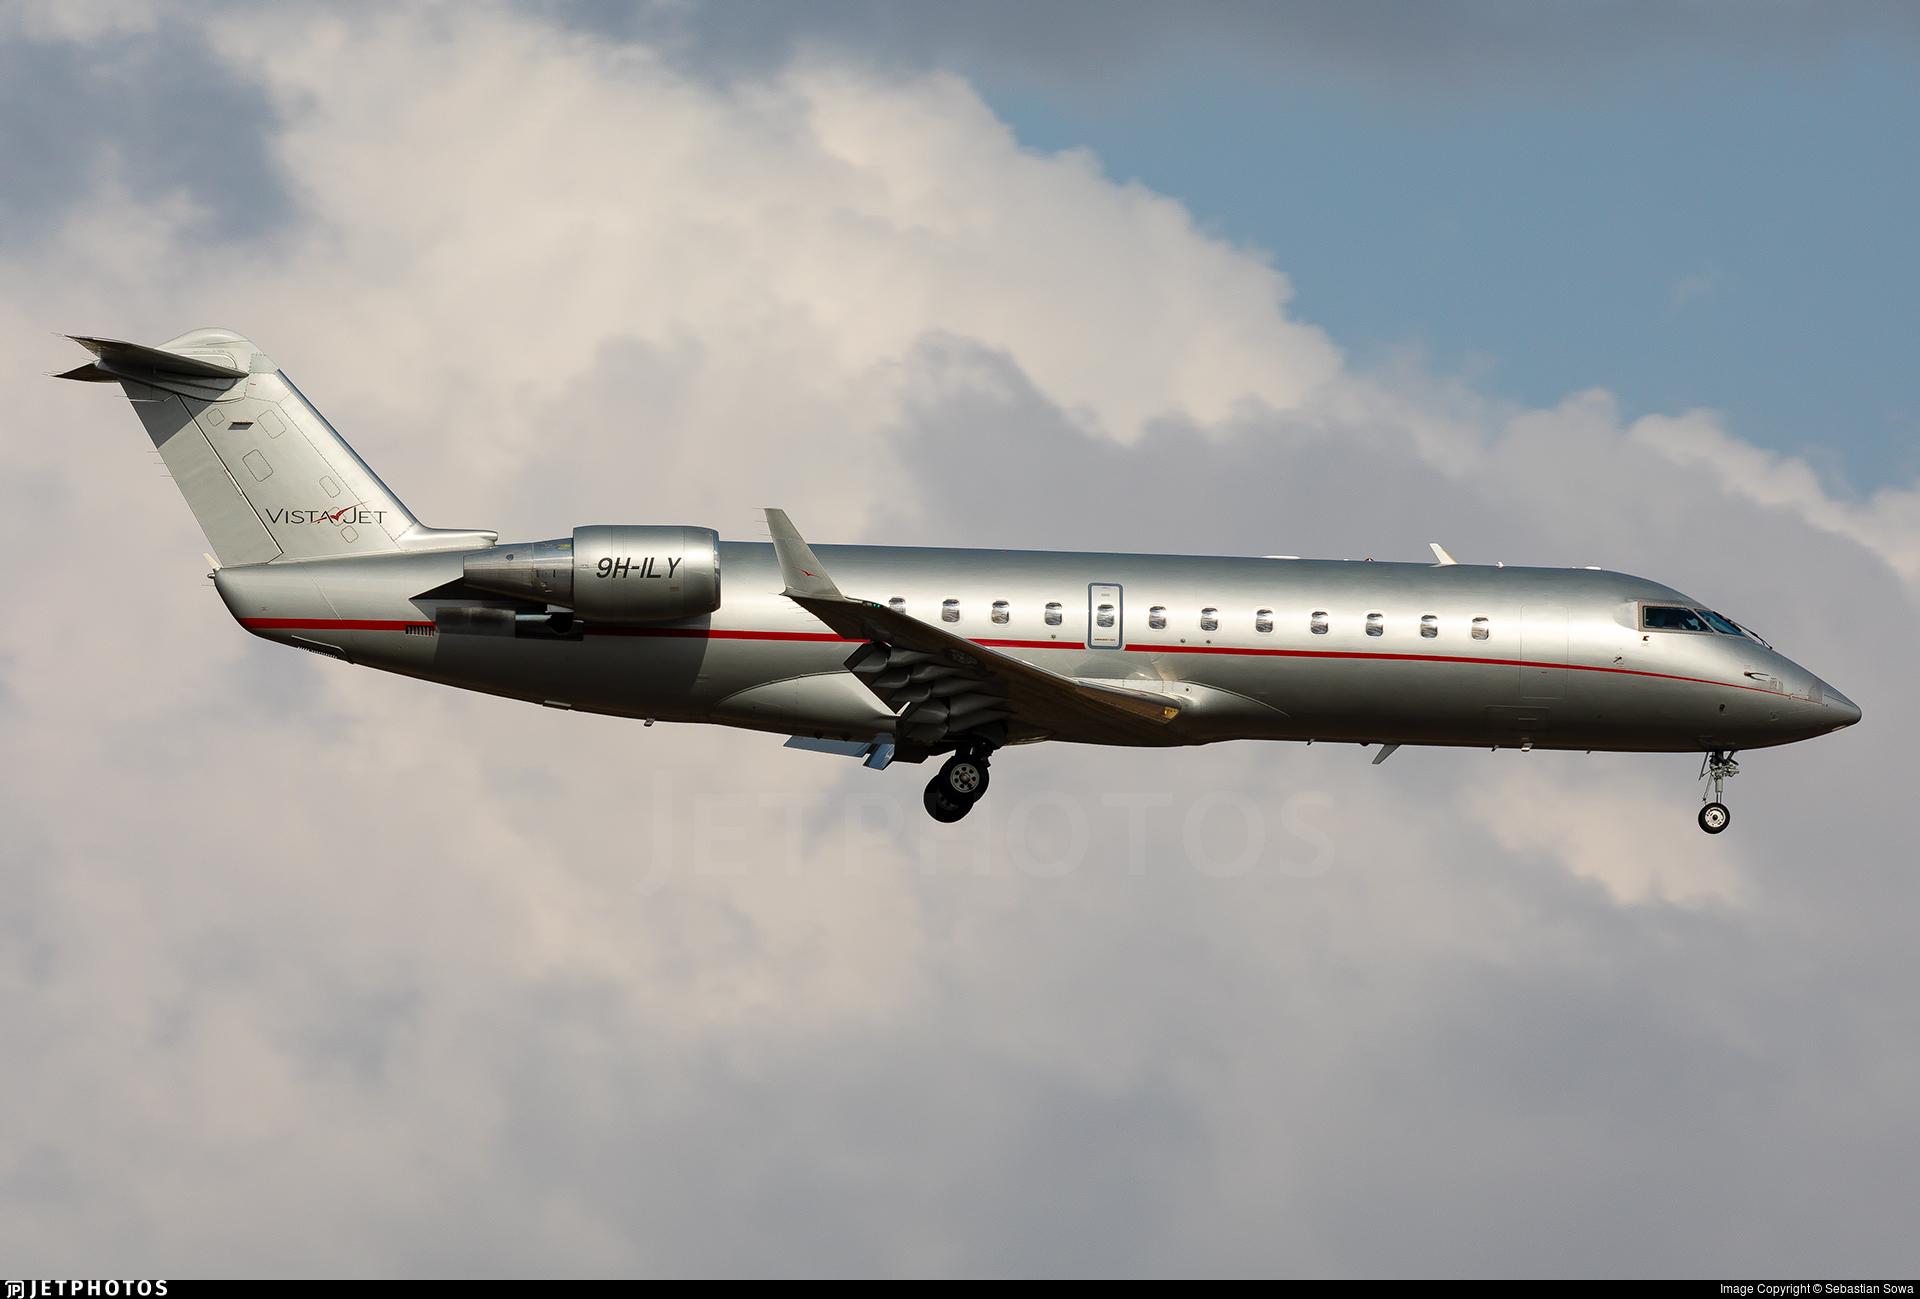 9H-ILY - Bombardier CL-600-2B19 Challenger 850 - VistaJet